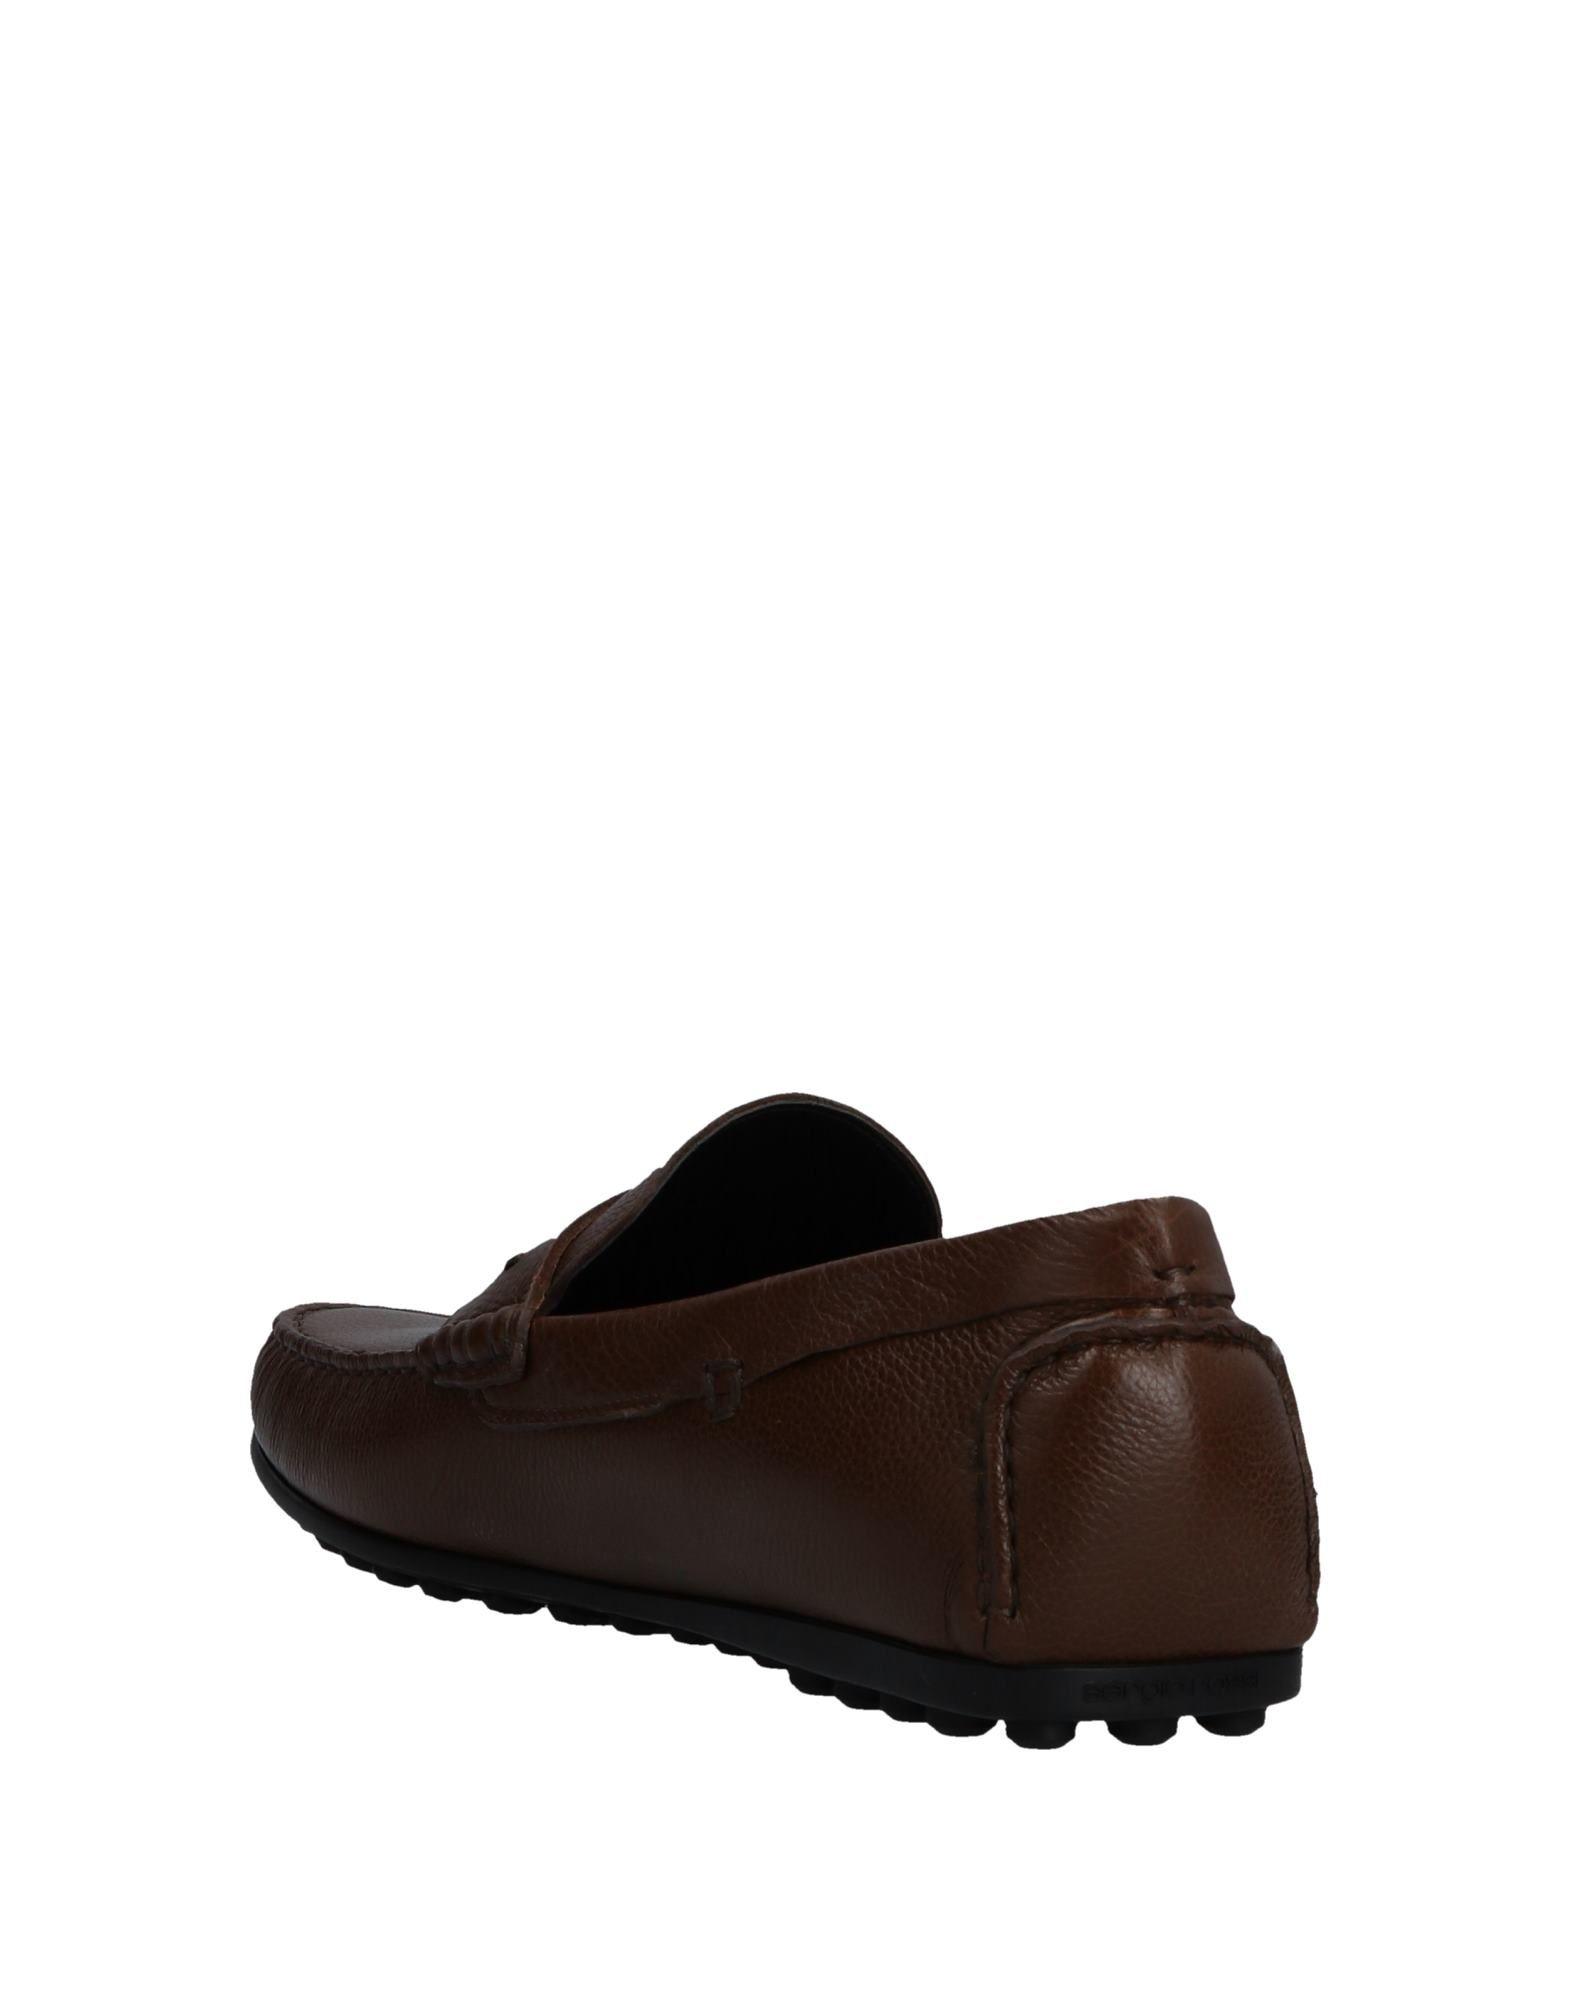 Sergio 11525958FT Rossi Mokassins Herren  11525958FT Sergio Gute Qualität beliebte Schuhe ac3a2a